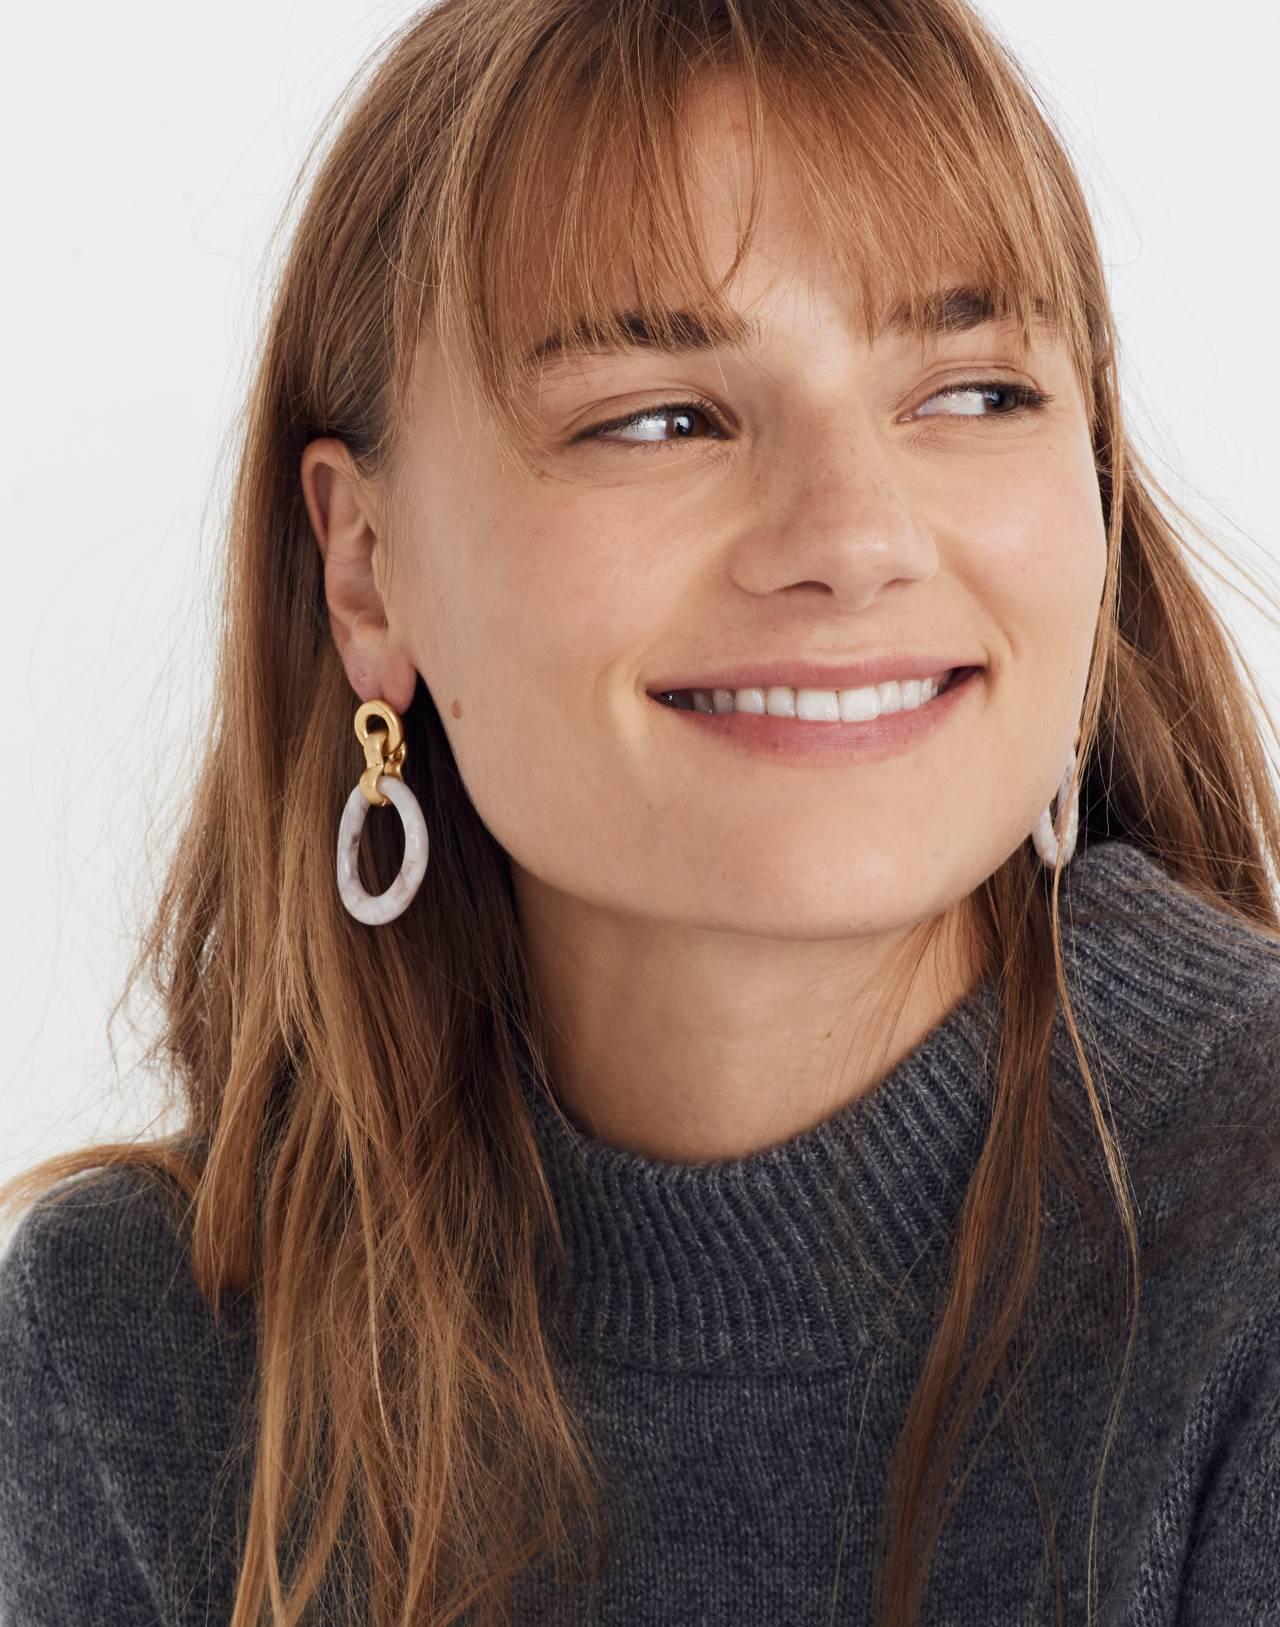 Acrylic Link Earrings in blush tort image 2